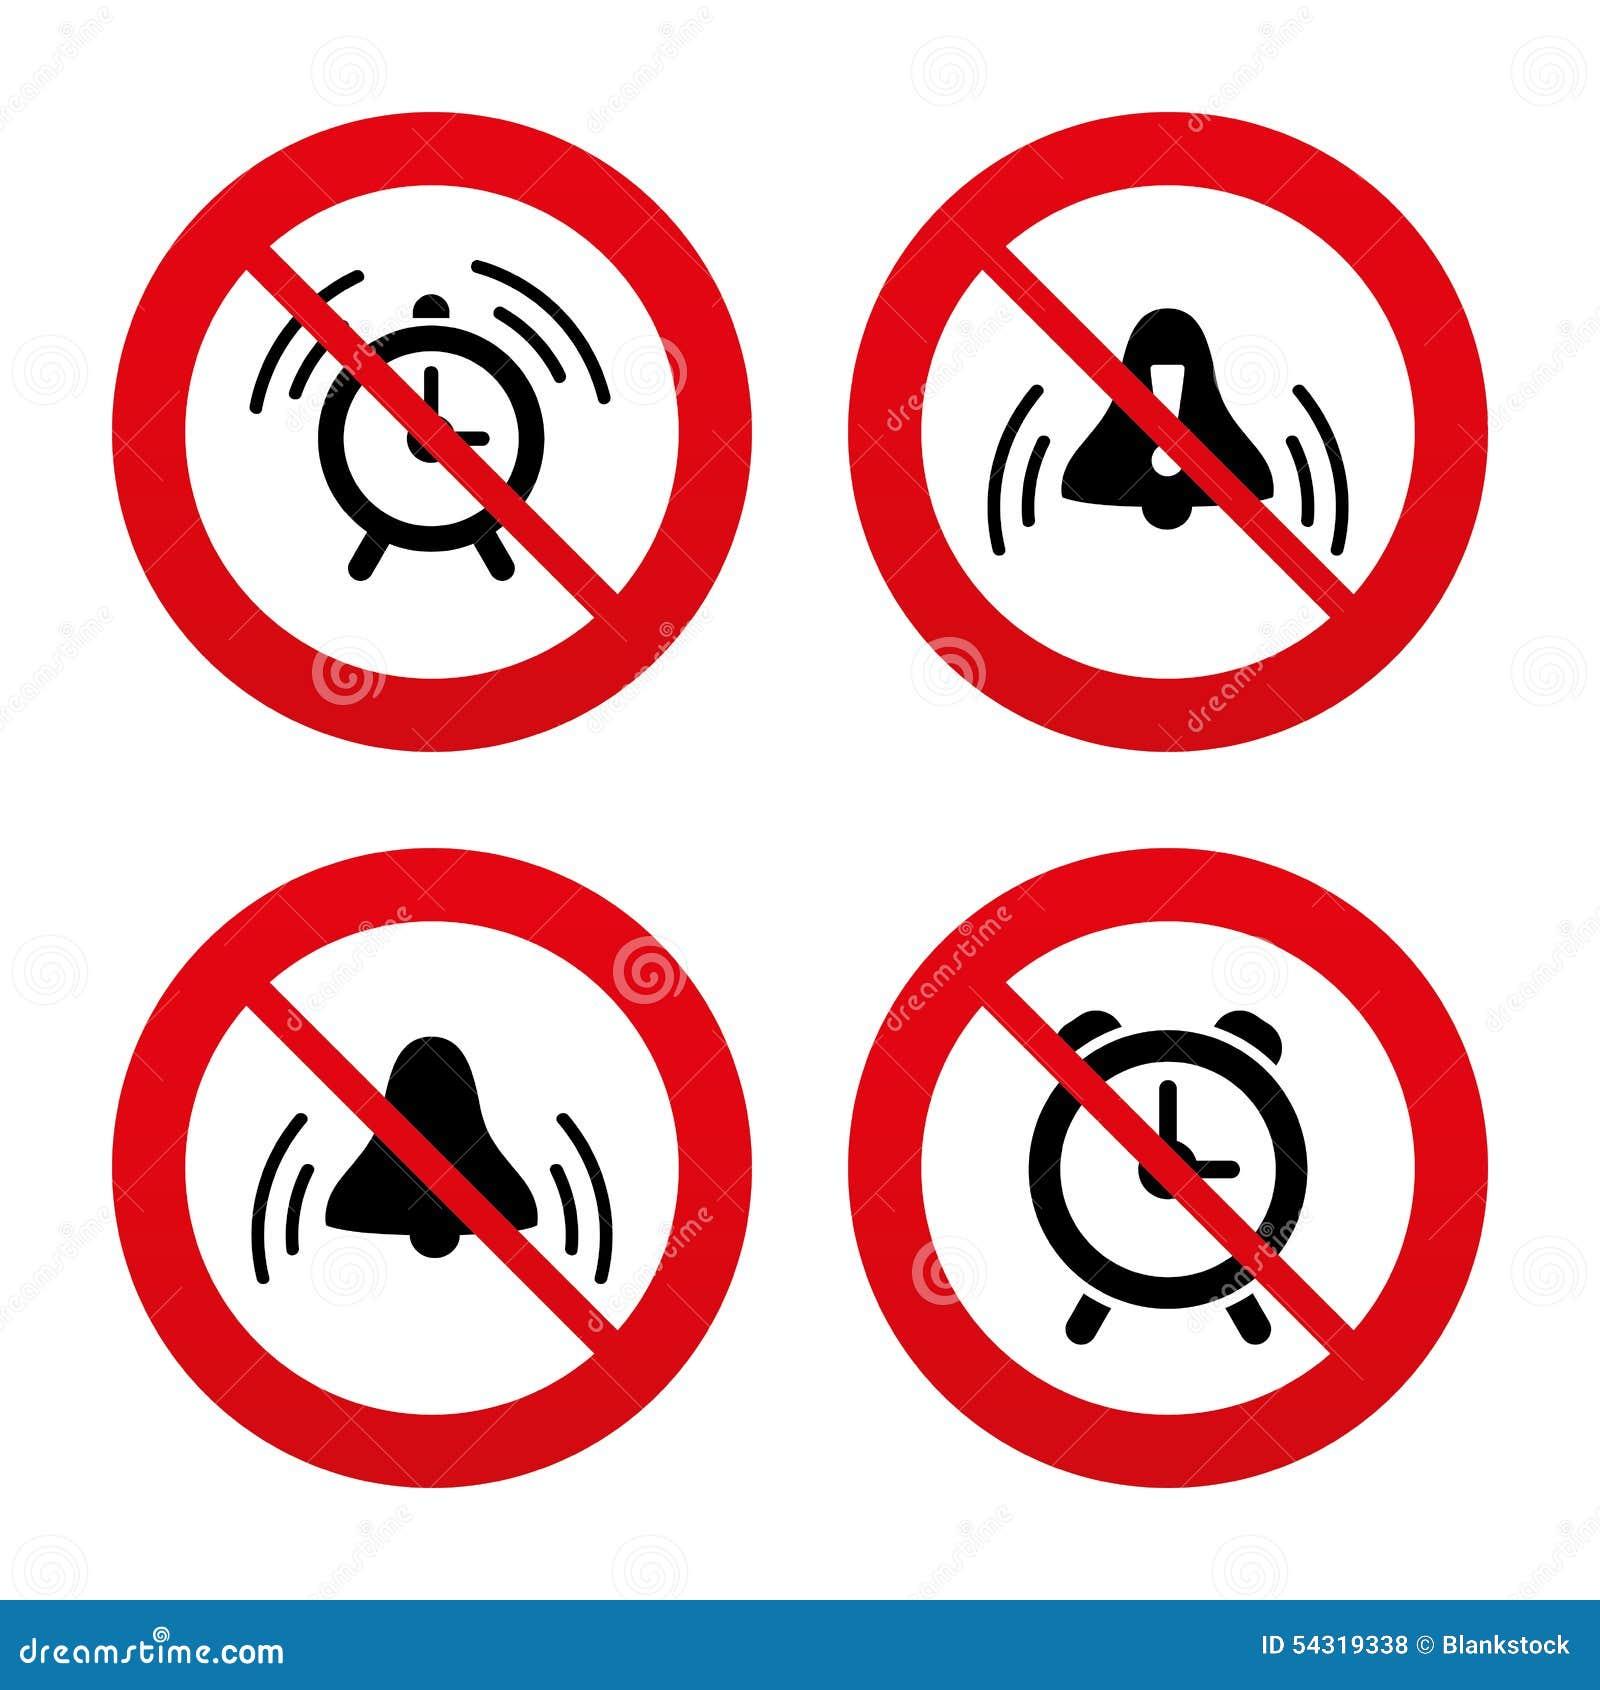 Alarm clock icons wake up bell signs symbols stock vector wake up bell signs symbols buycottarizona Choice Image